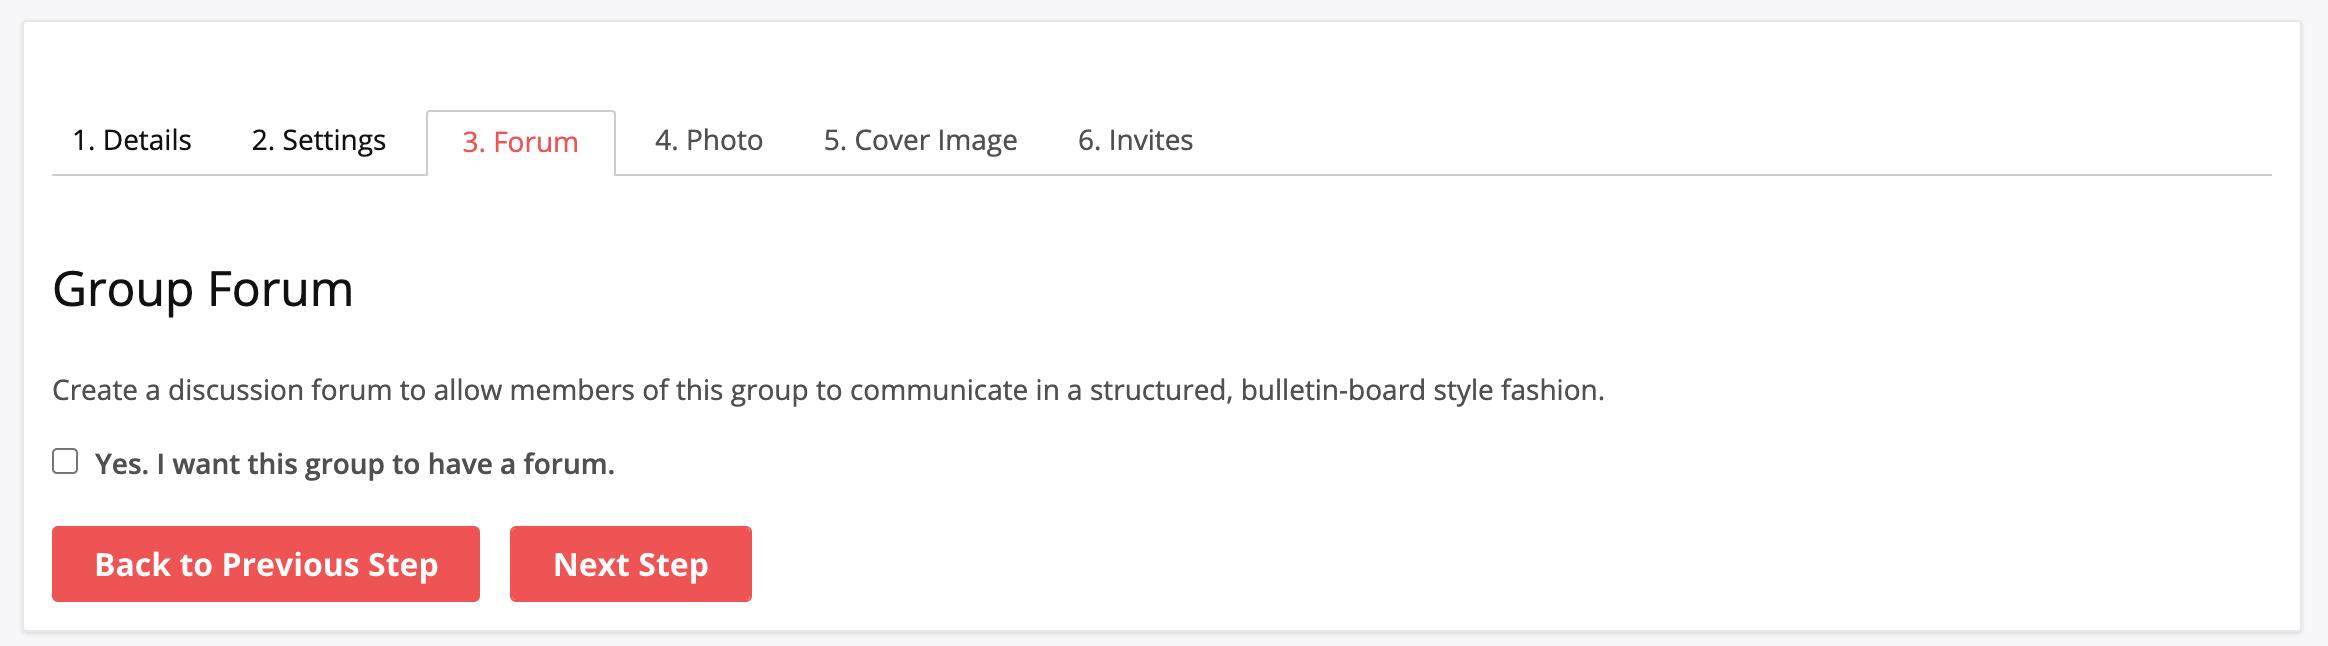 BuddyPress group Forum Integration